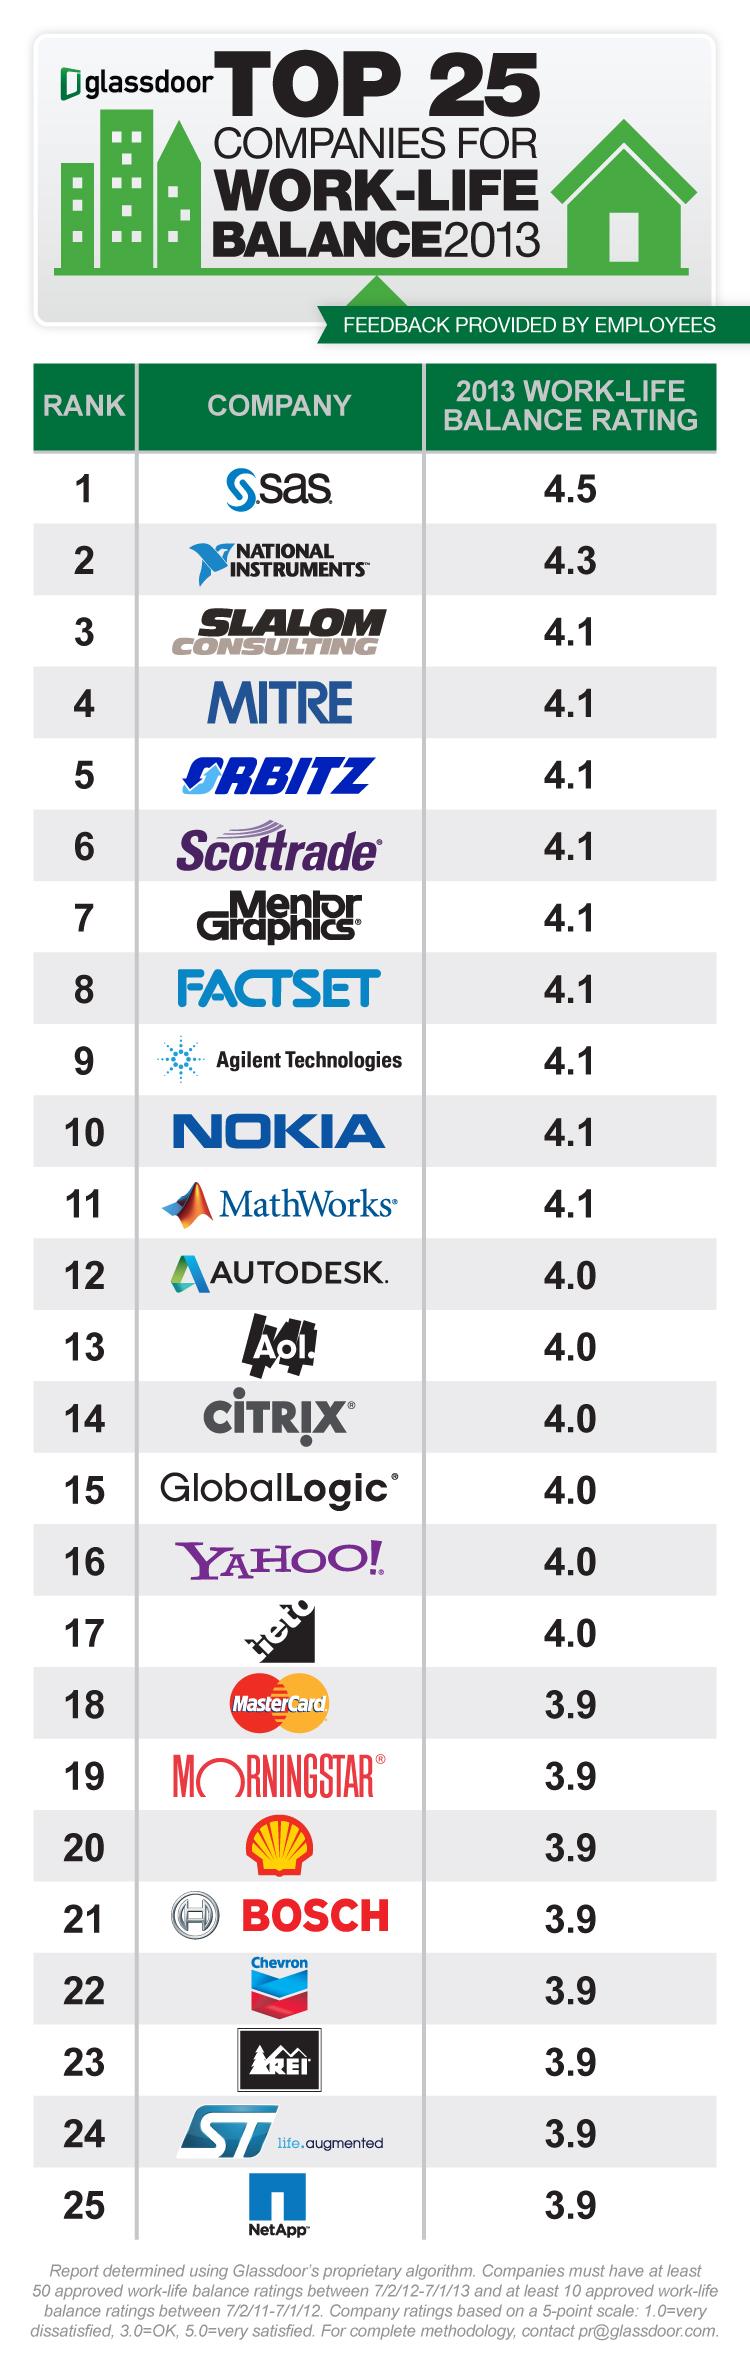 Top 25 Companies for Work Life Balance 2013 from Glassdoor